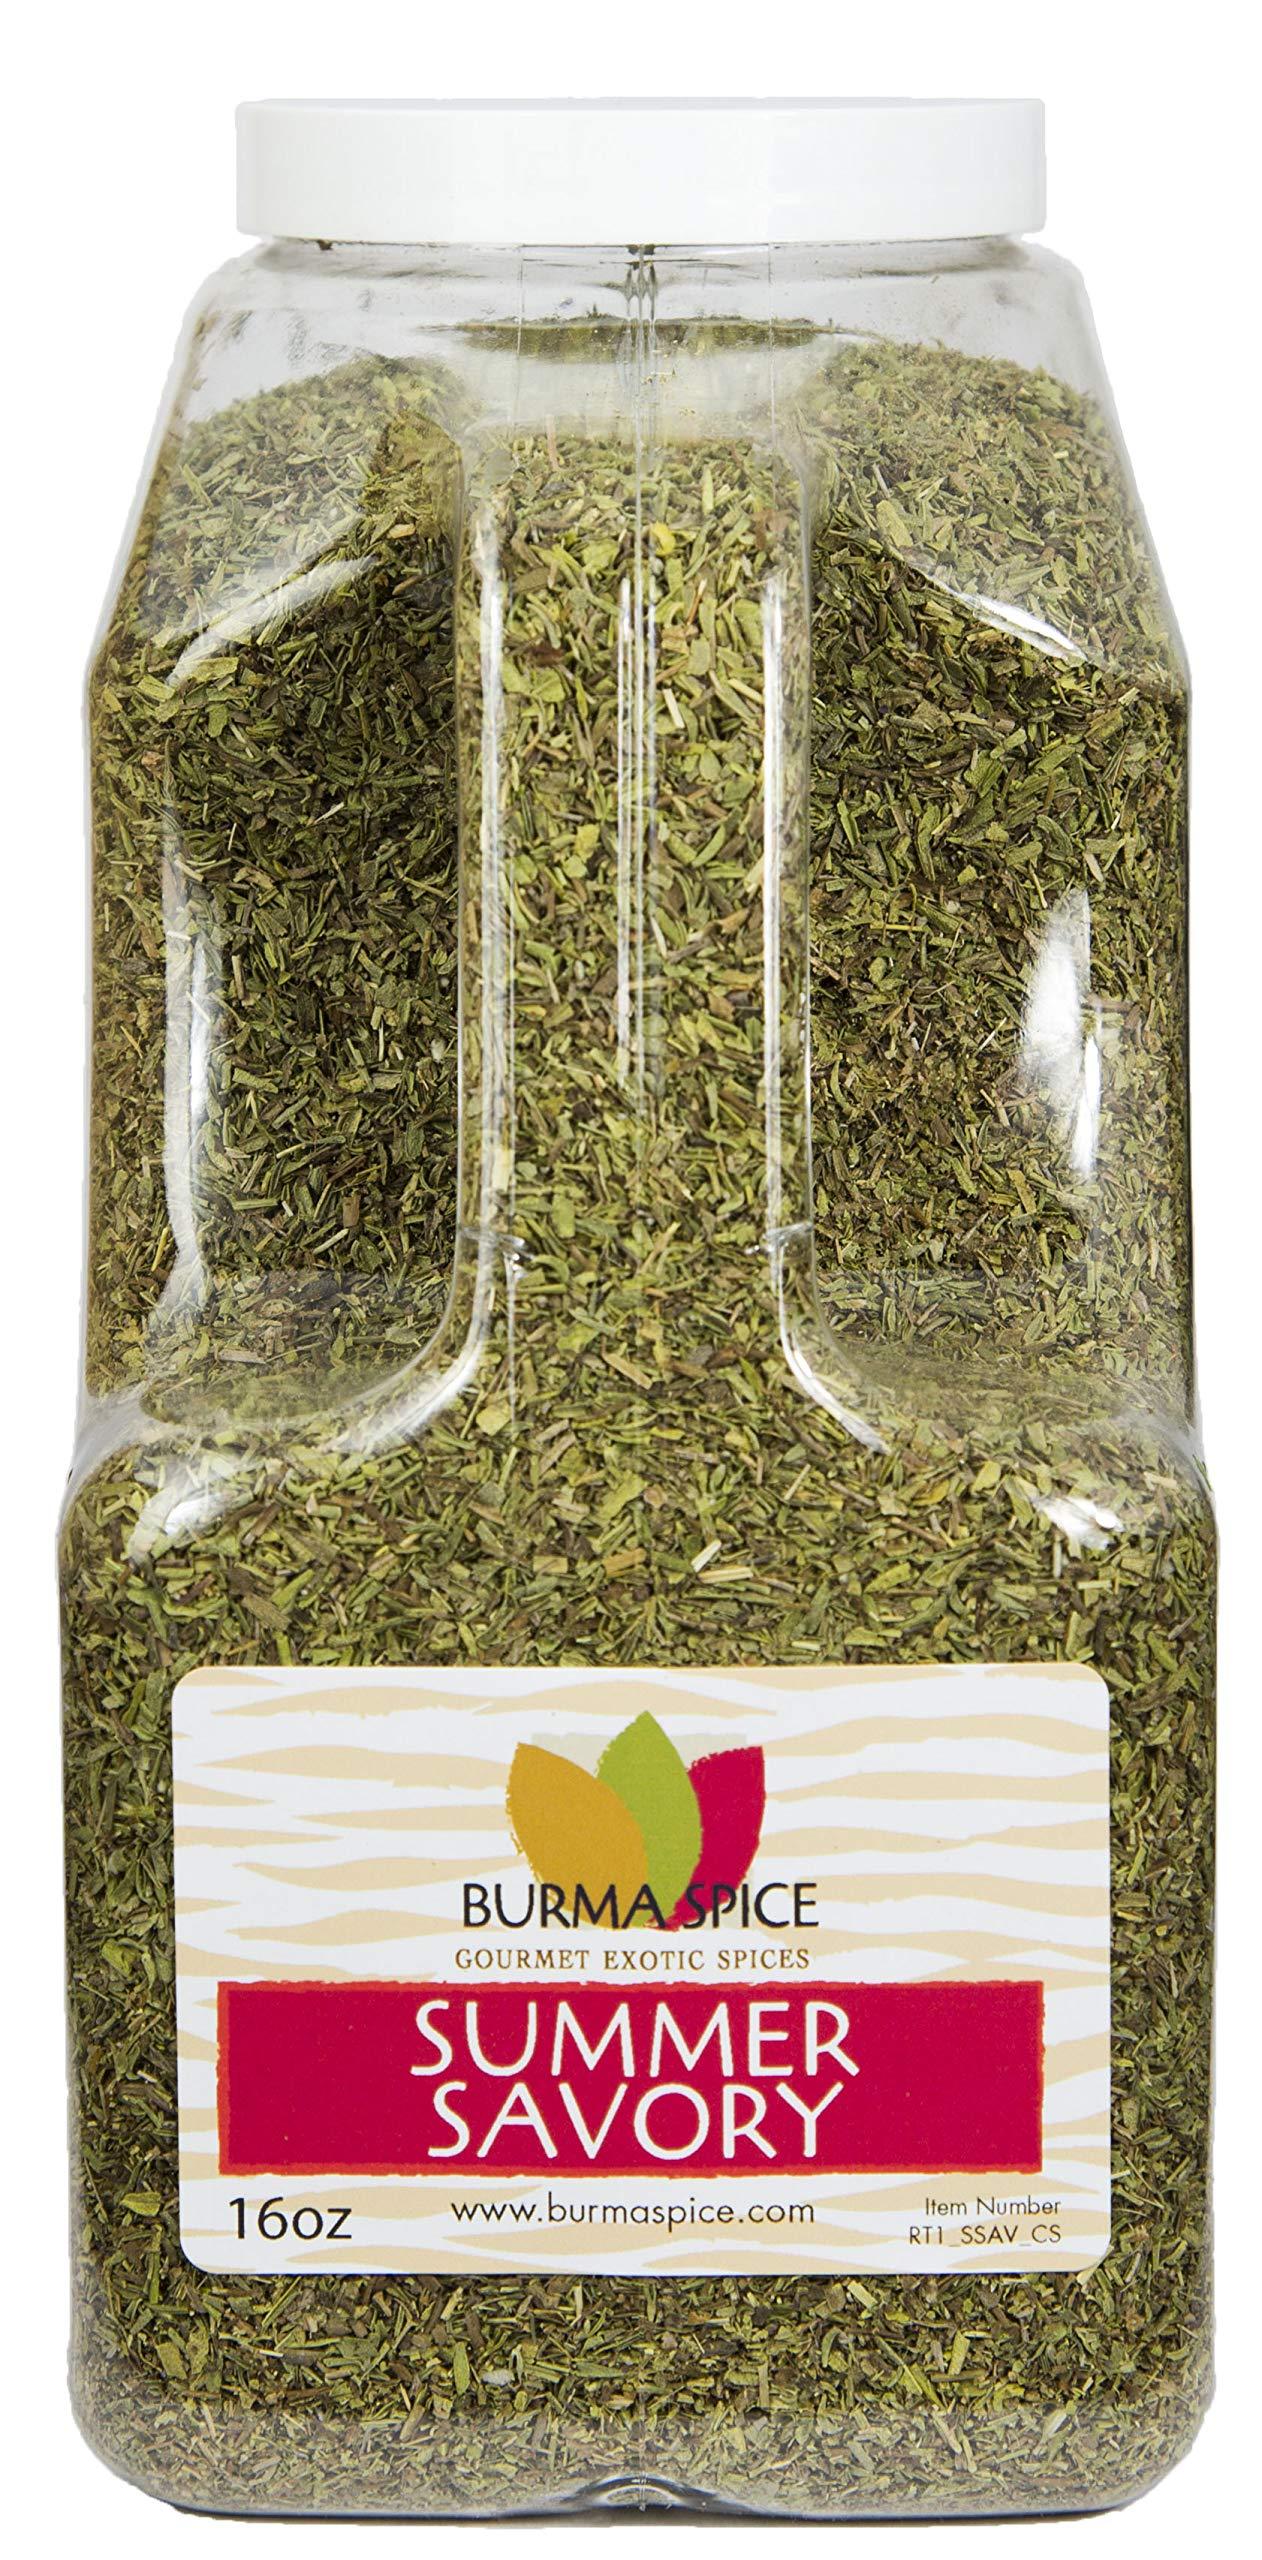 Summer Savory : Dried Herb : All Natural : No additives, Seasoning Spice : Kosher (16oz.)